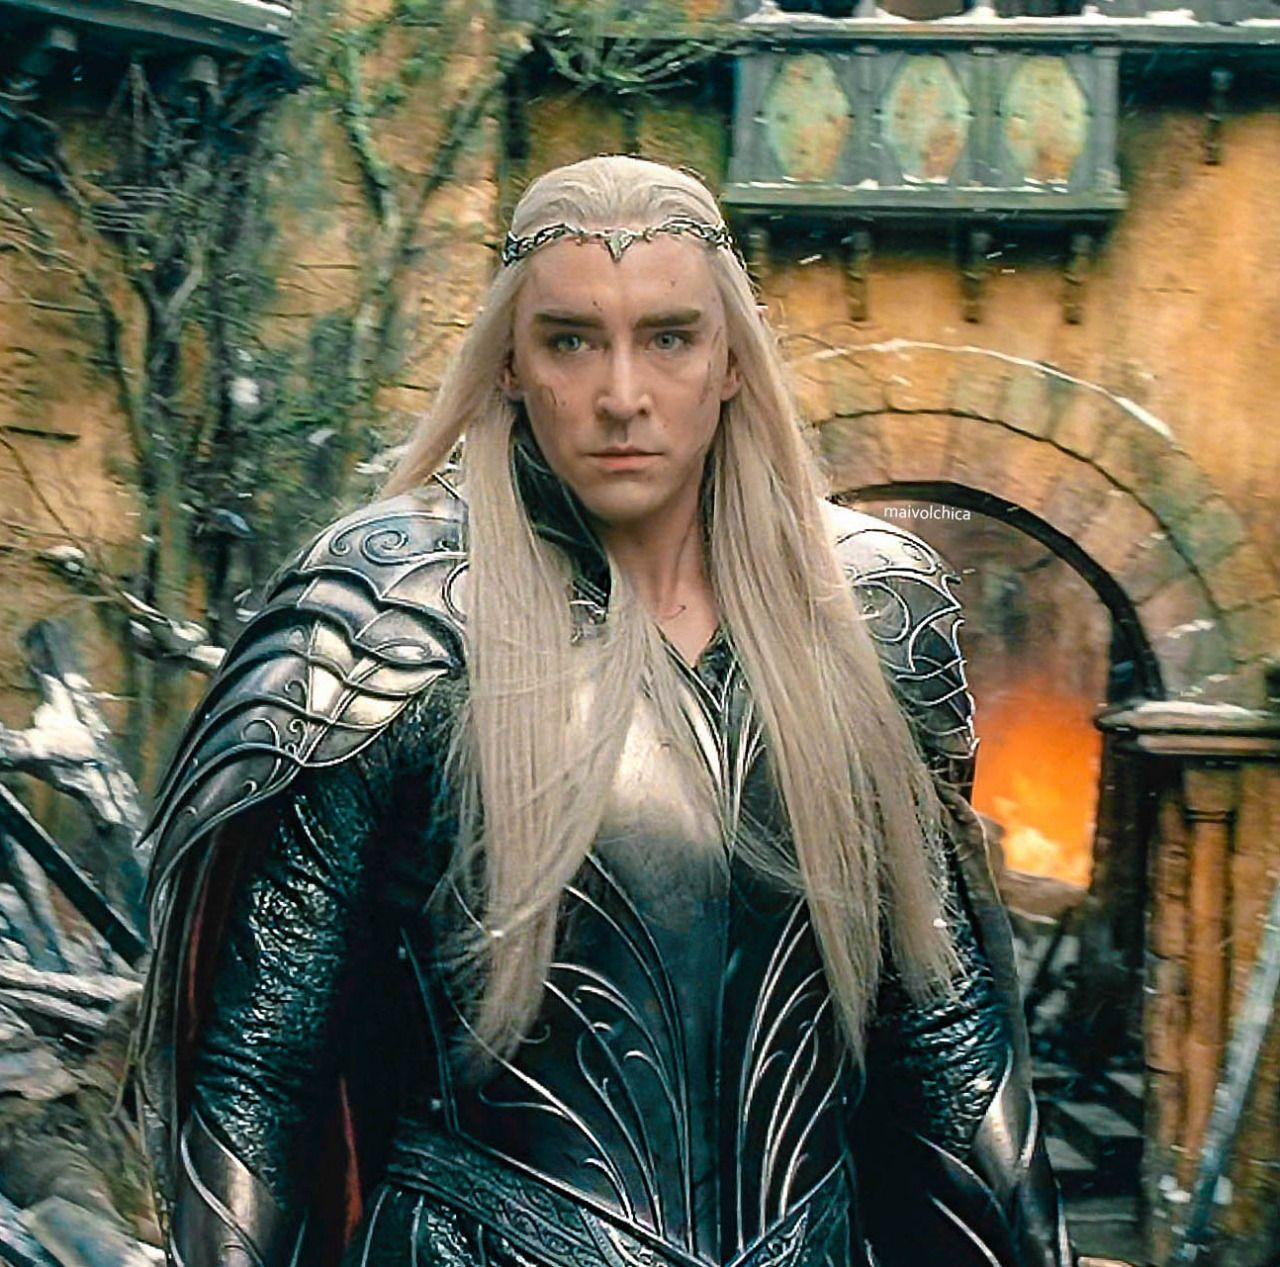 maivolchica | Thranduil, Legolas and thranduil, The hobbit